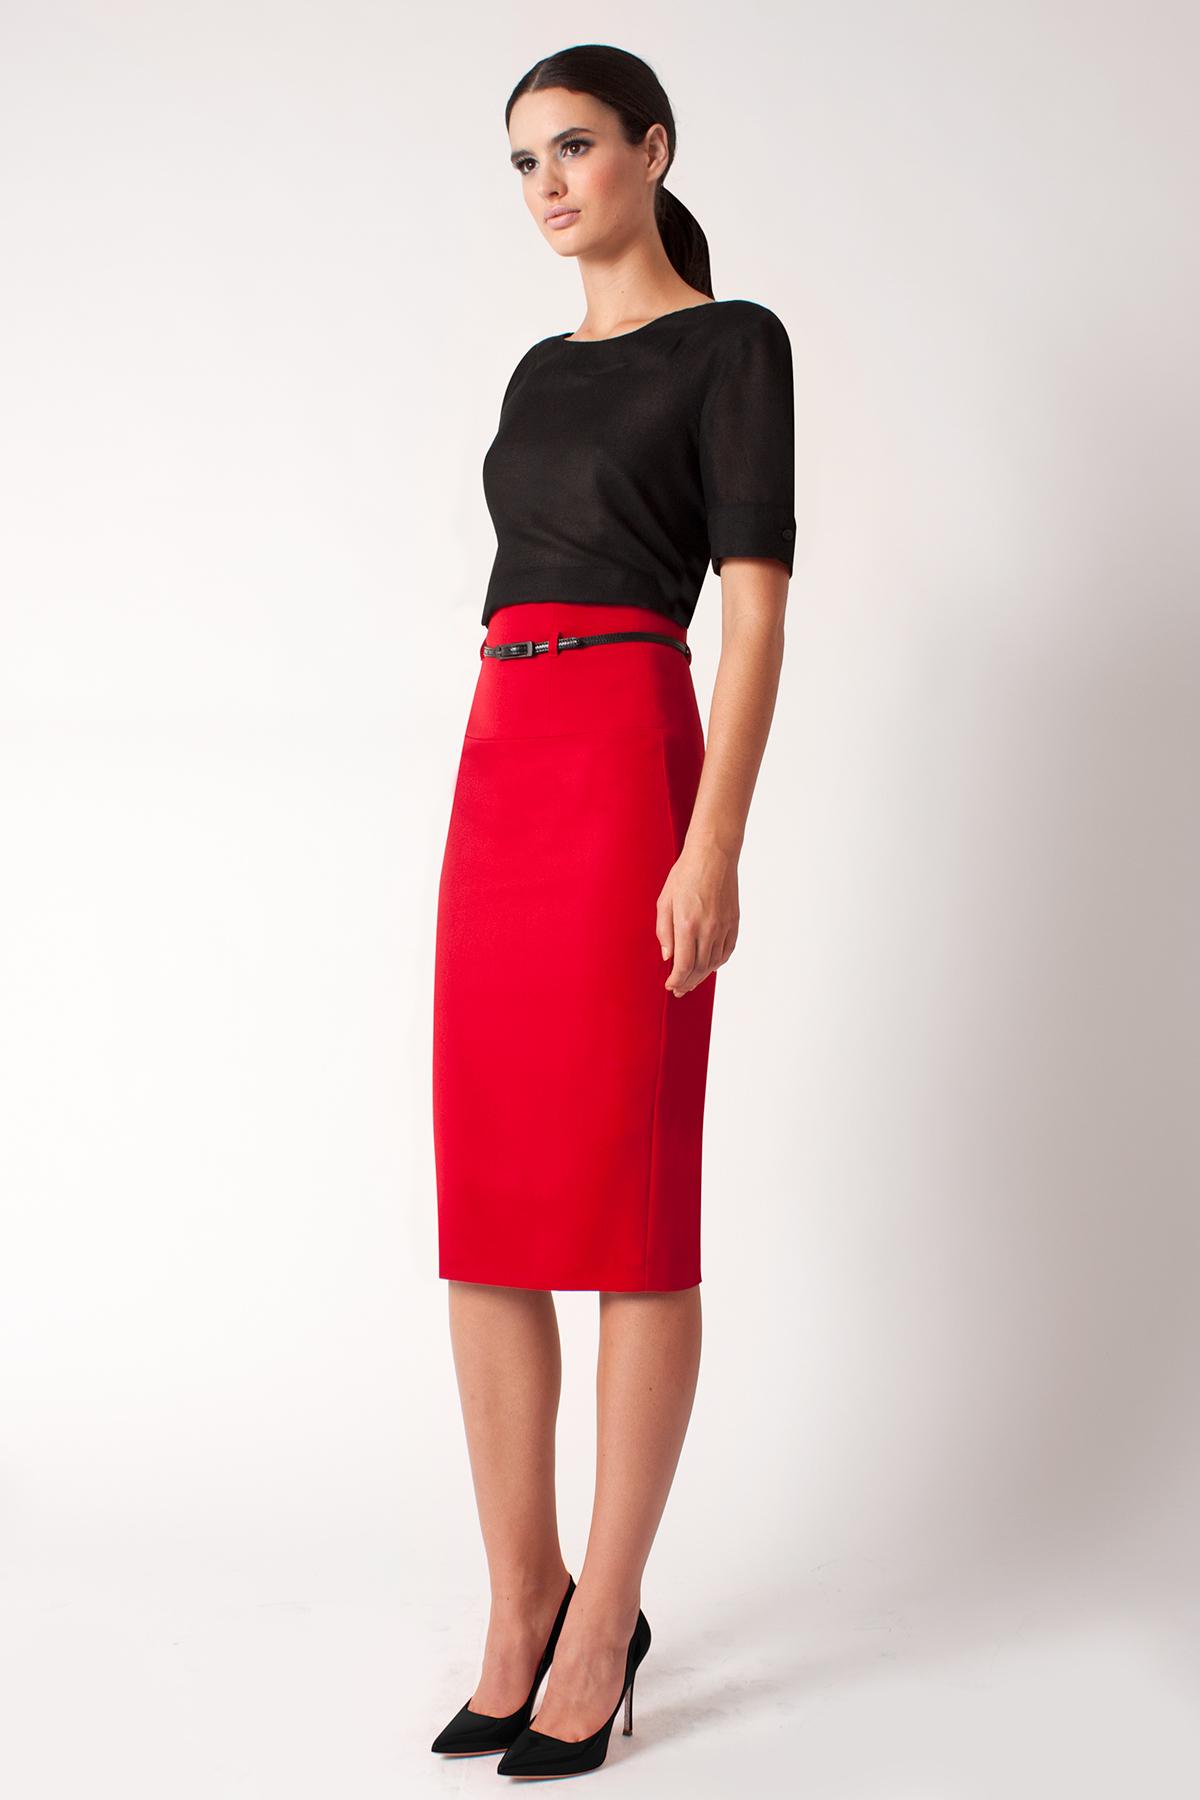 b01dc055d1 High Waisted Red Pencil Skirt - Image Skirt and Slipper Imagepv.co